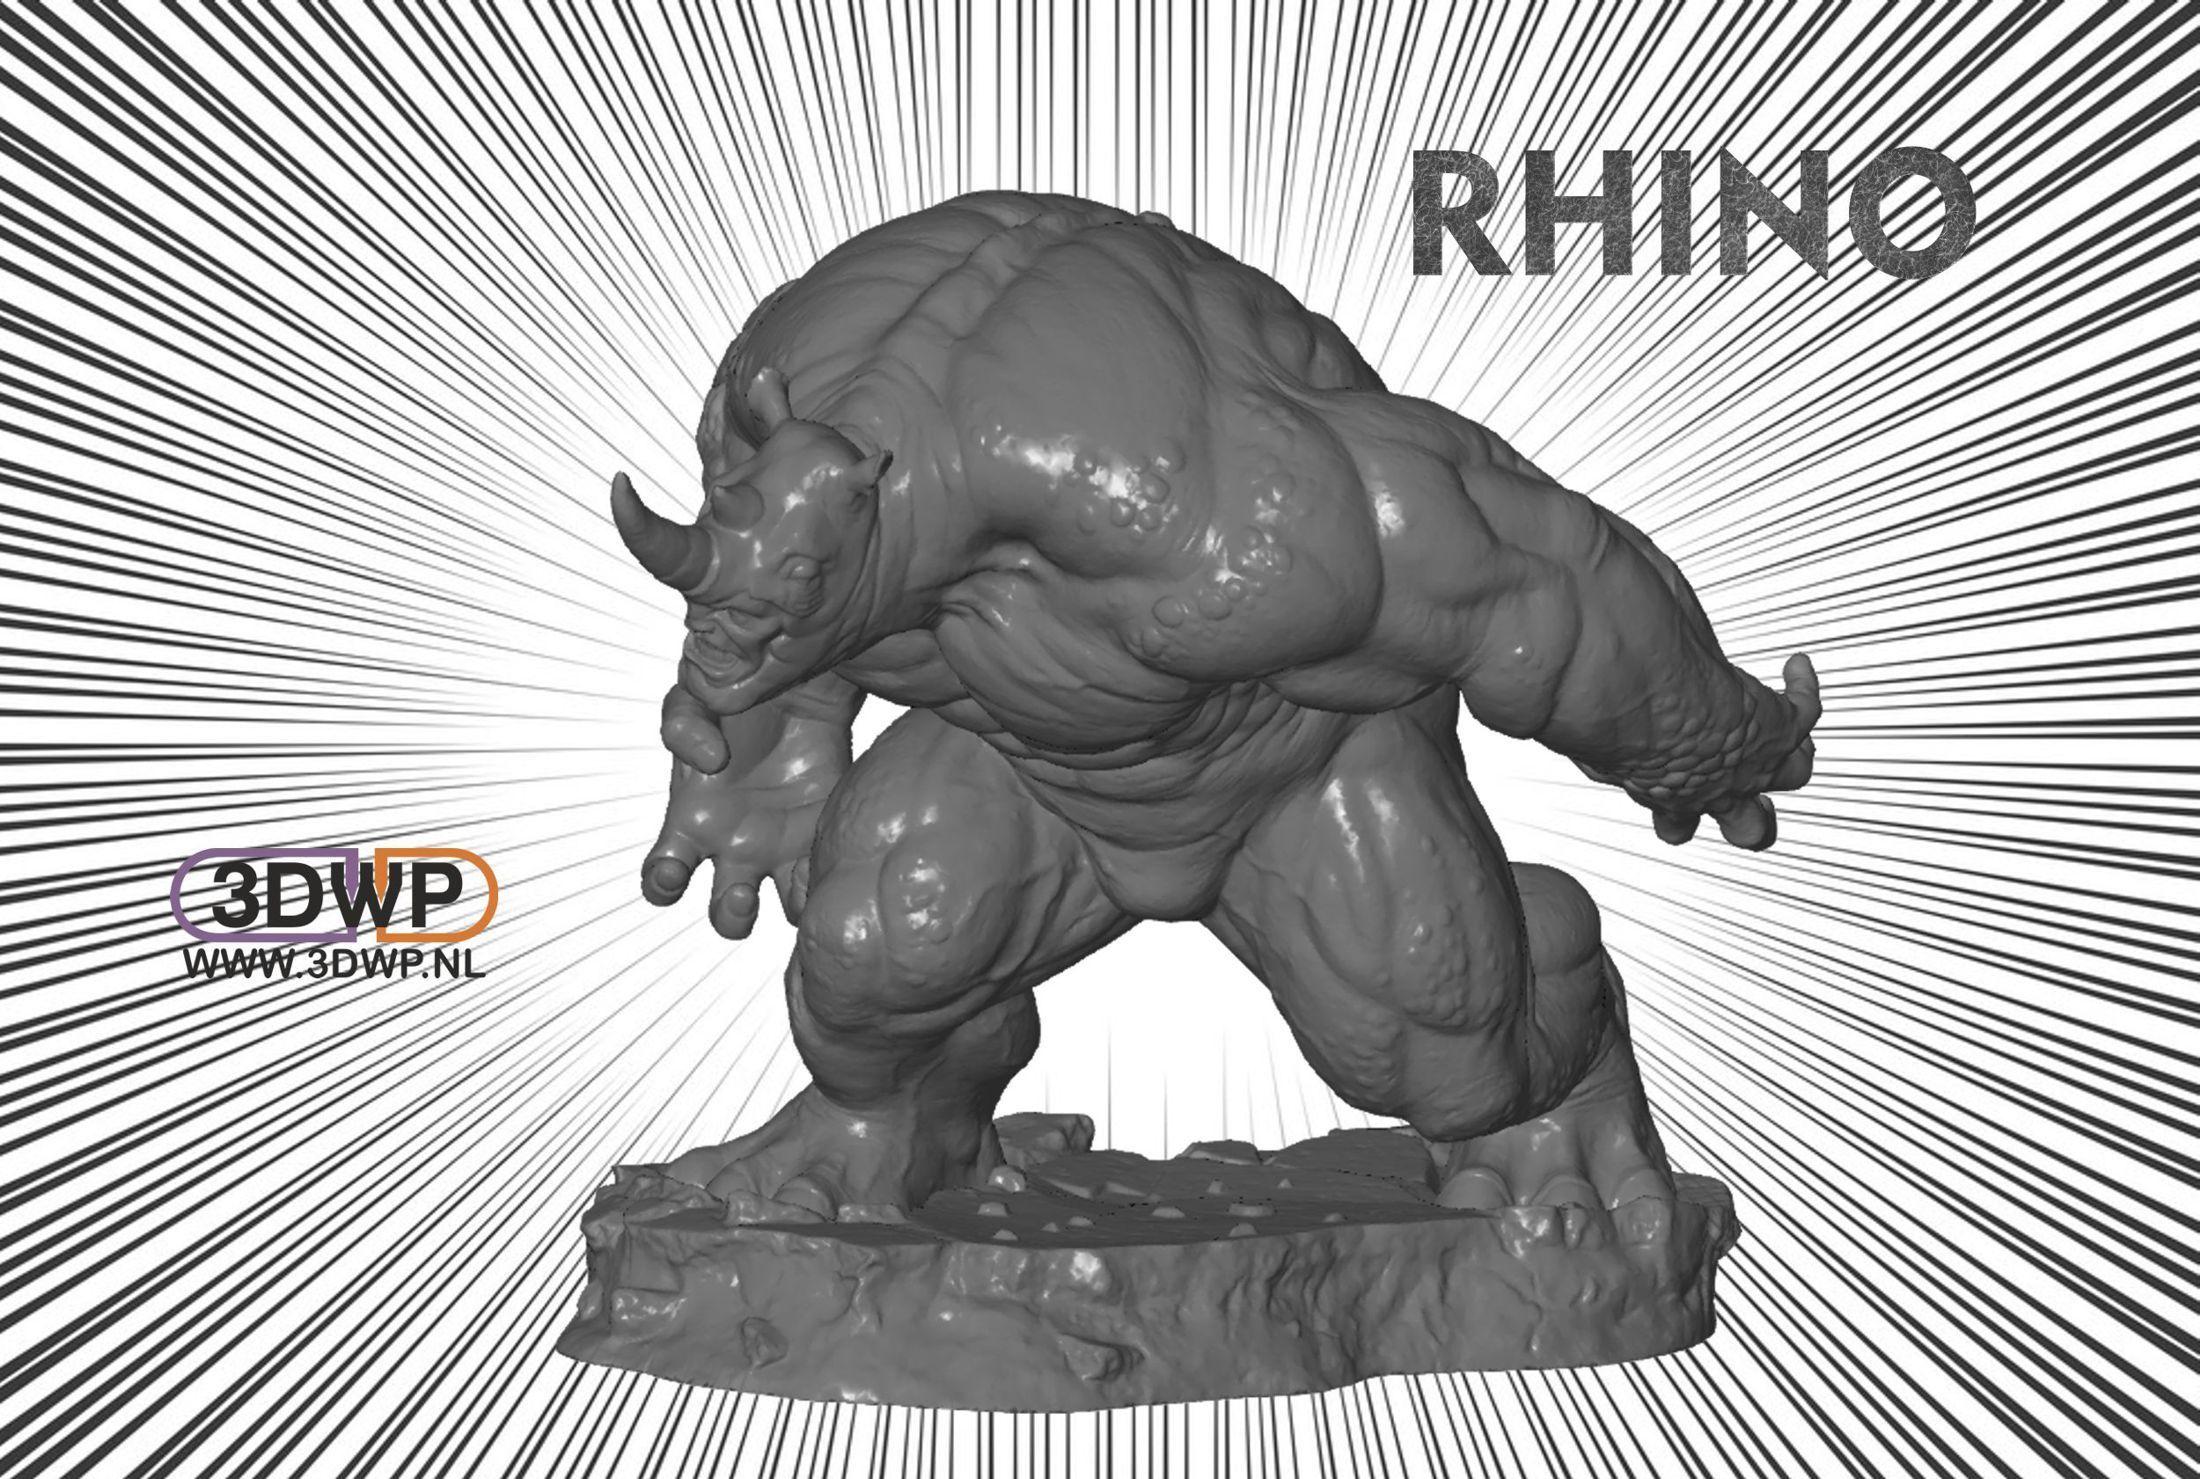 Rhino.jpg Download free STL file Rhino Statue (Spider-Man) • 3D printer template, 3DWP